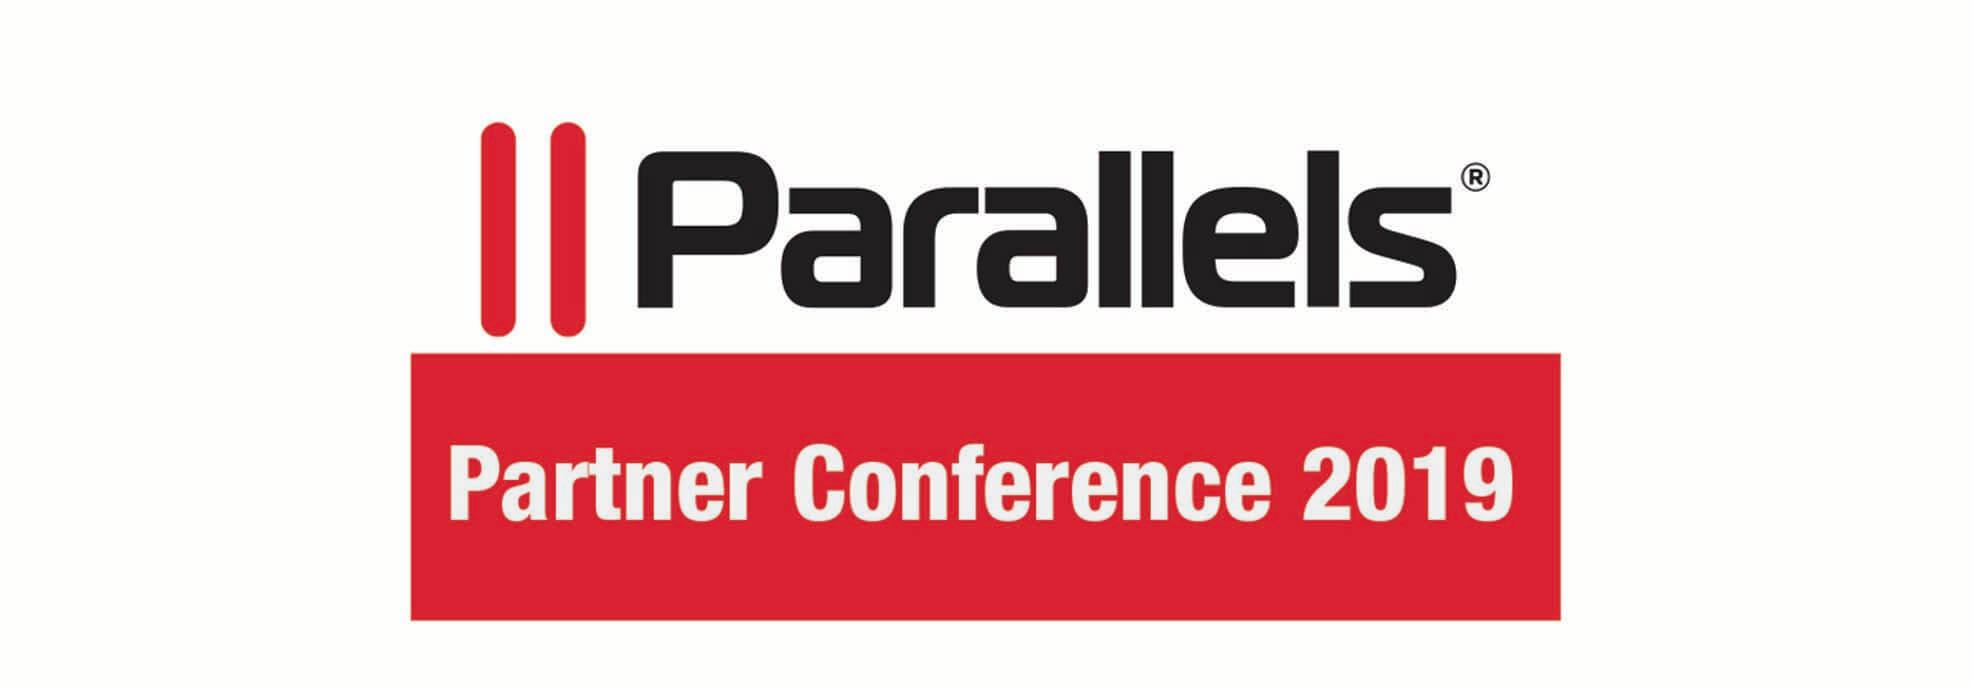 EMEA Parallels Partner Conference 2019